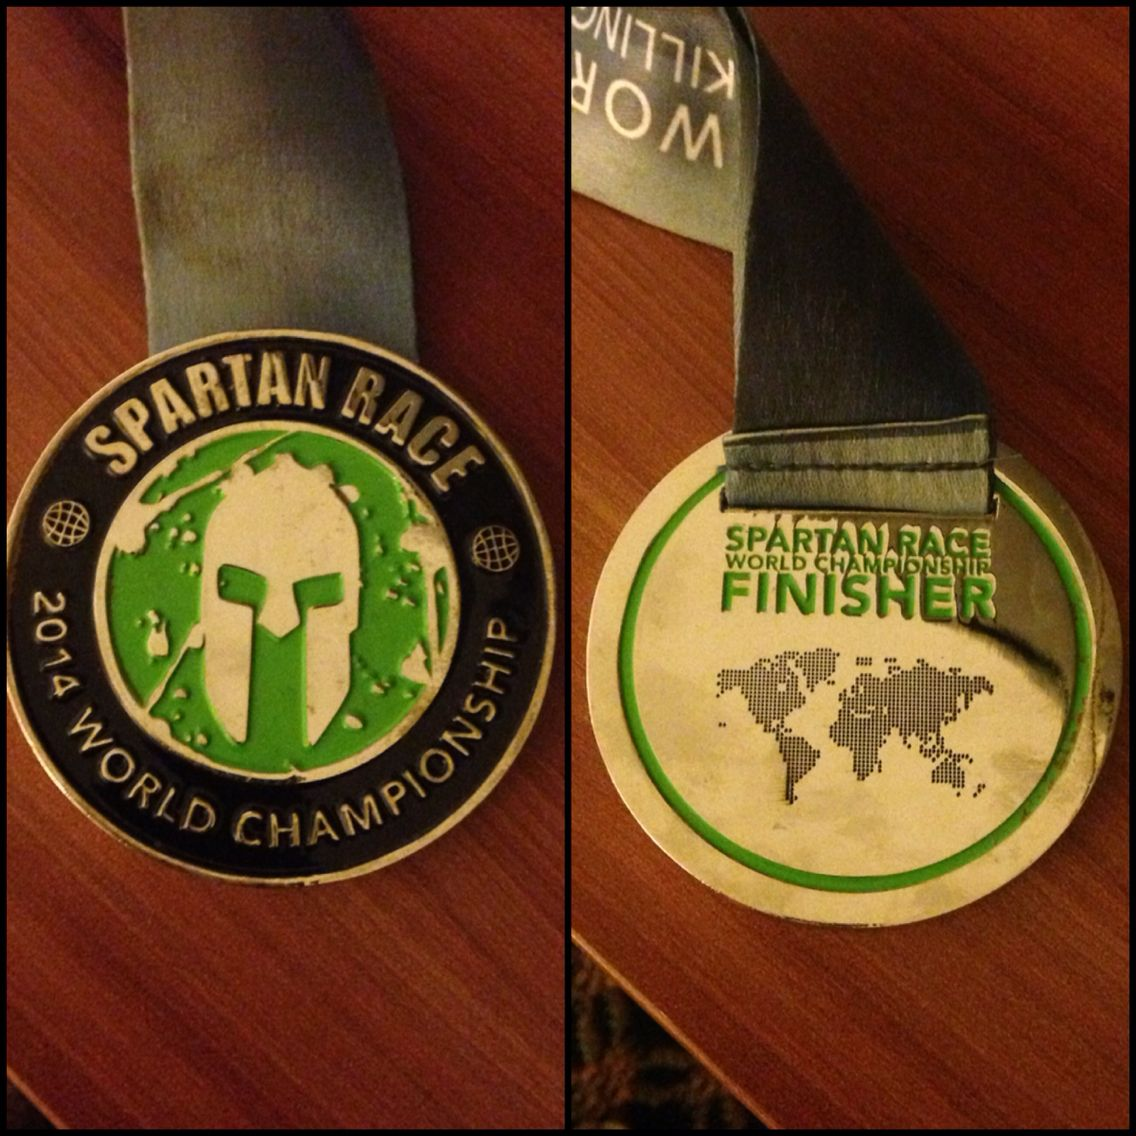 Spartan world championship finisher